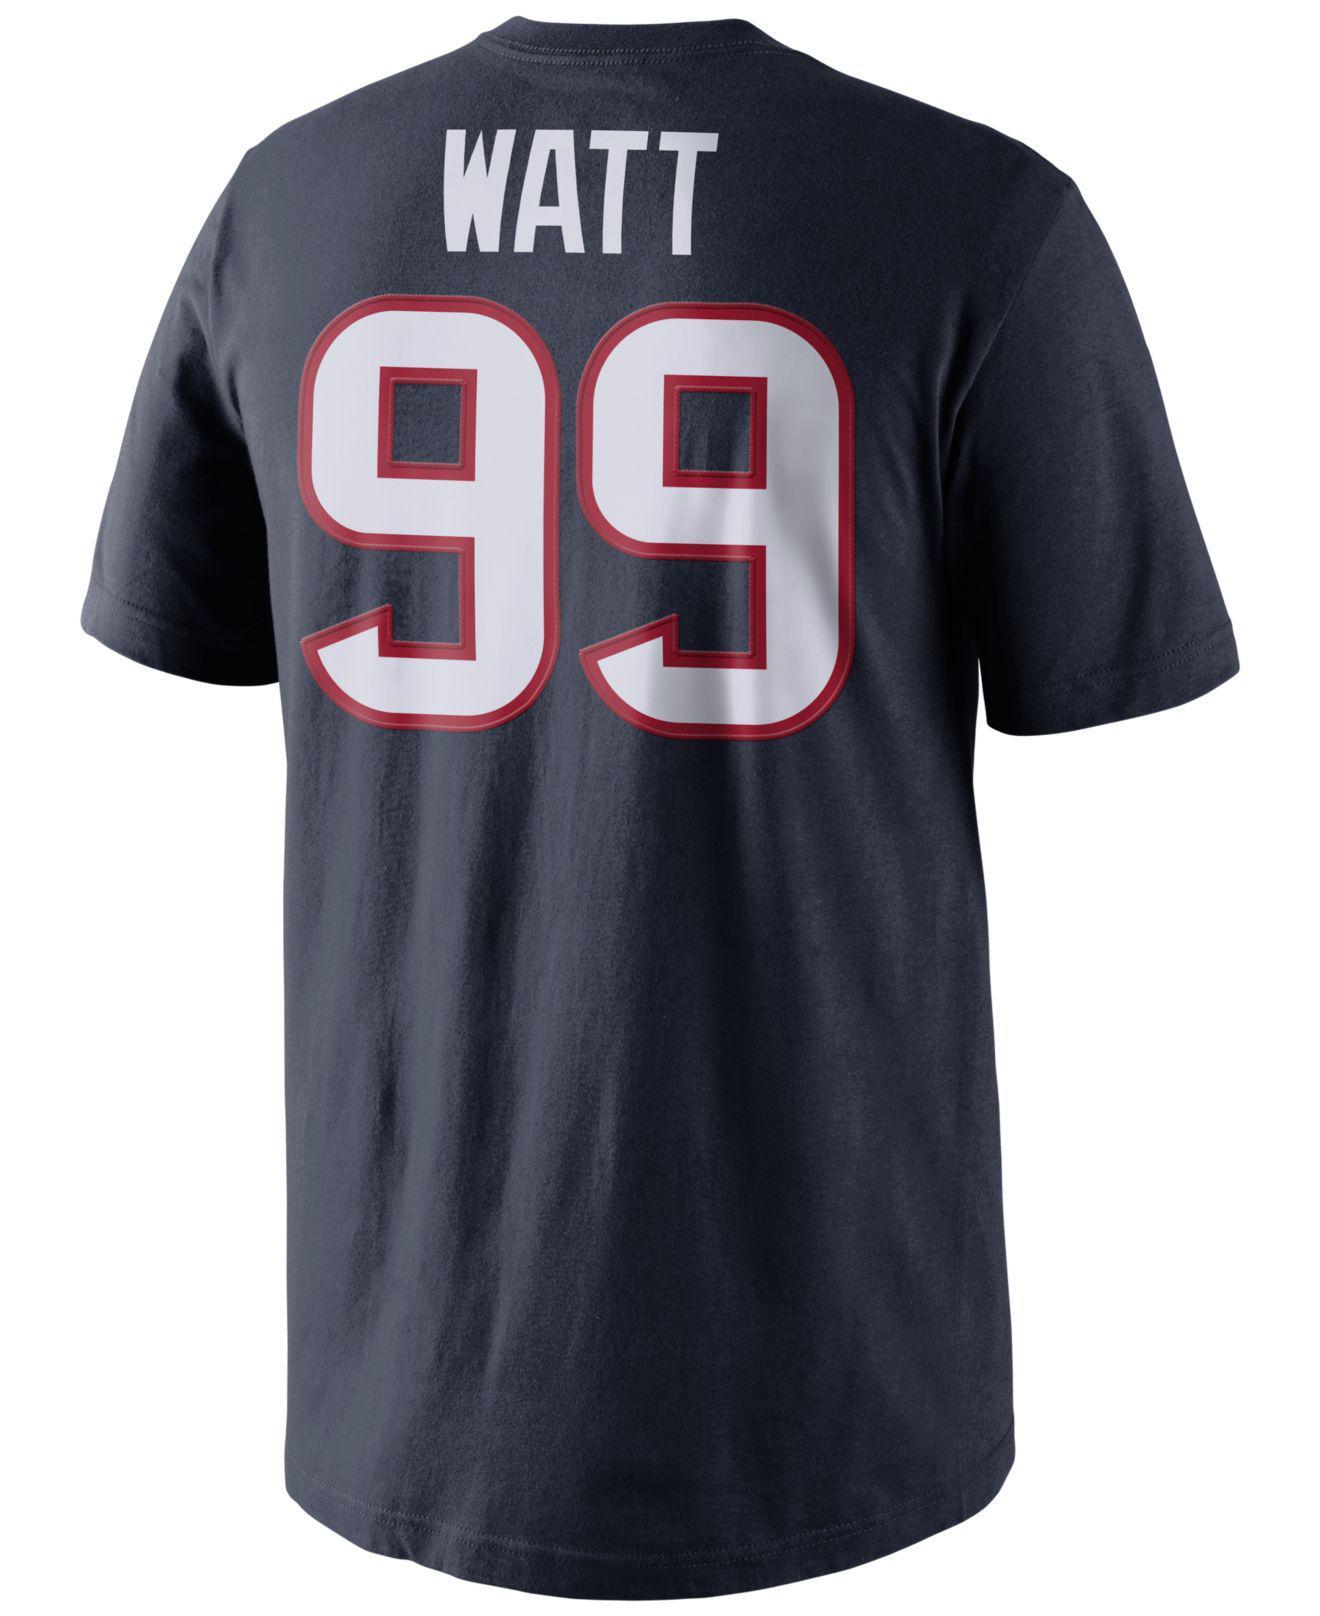 25ed7299ced Lyst - Nike Men s Short-sleeve Jj Watt Houston Texans Pride T-shirt ...